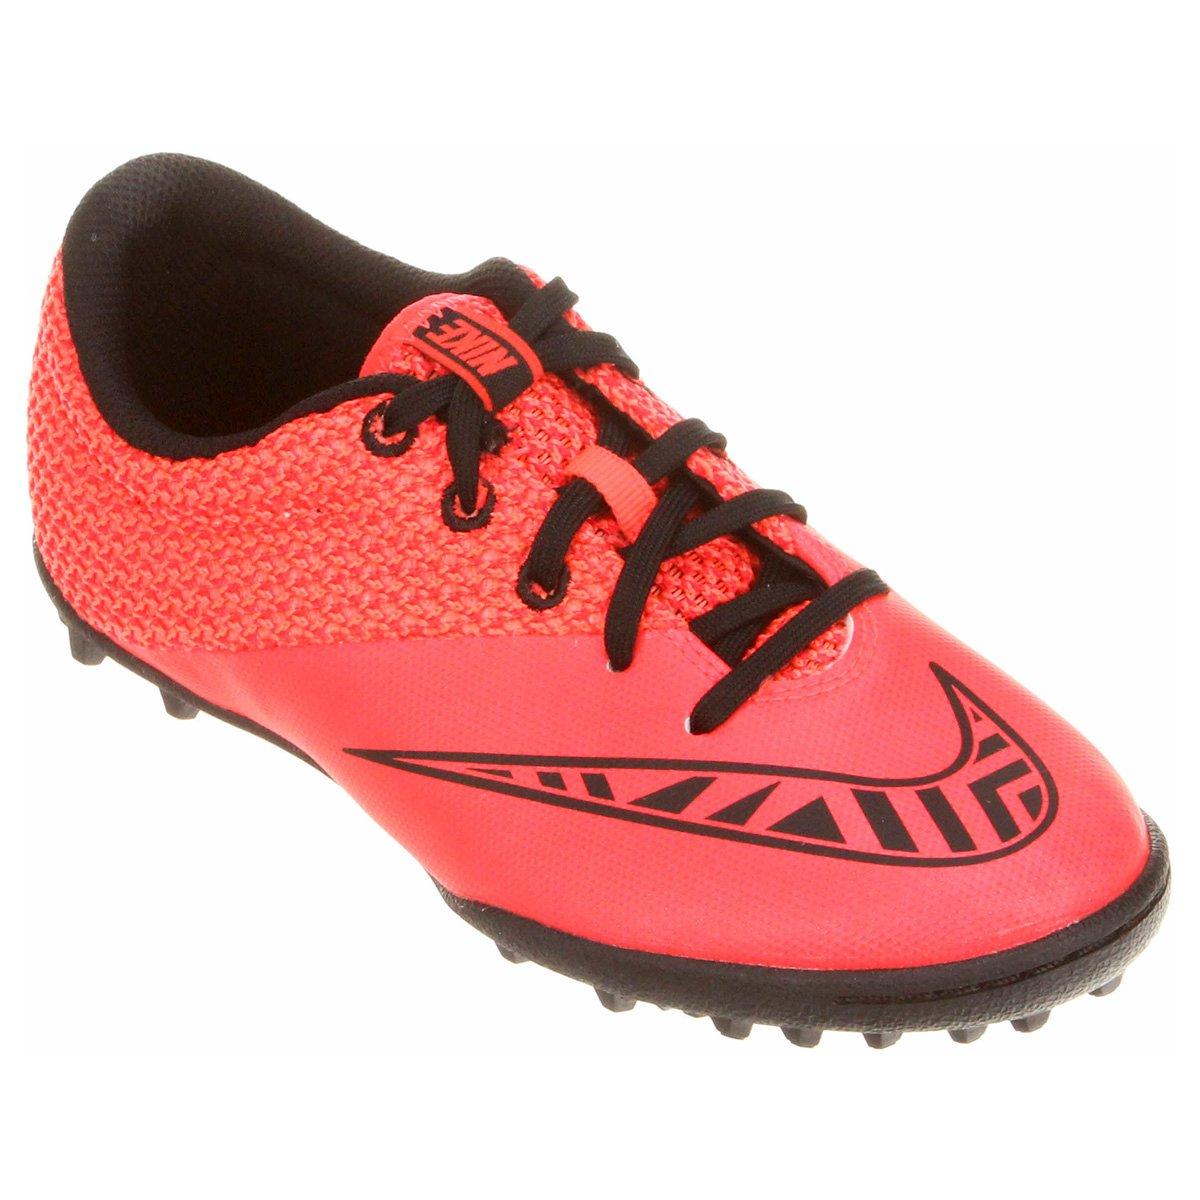 46d15be794 Chuteira Nike Mercurial Pro TF Society Infantil - Compre Agora ...